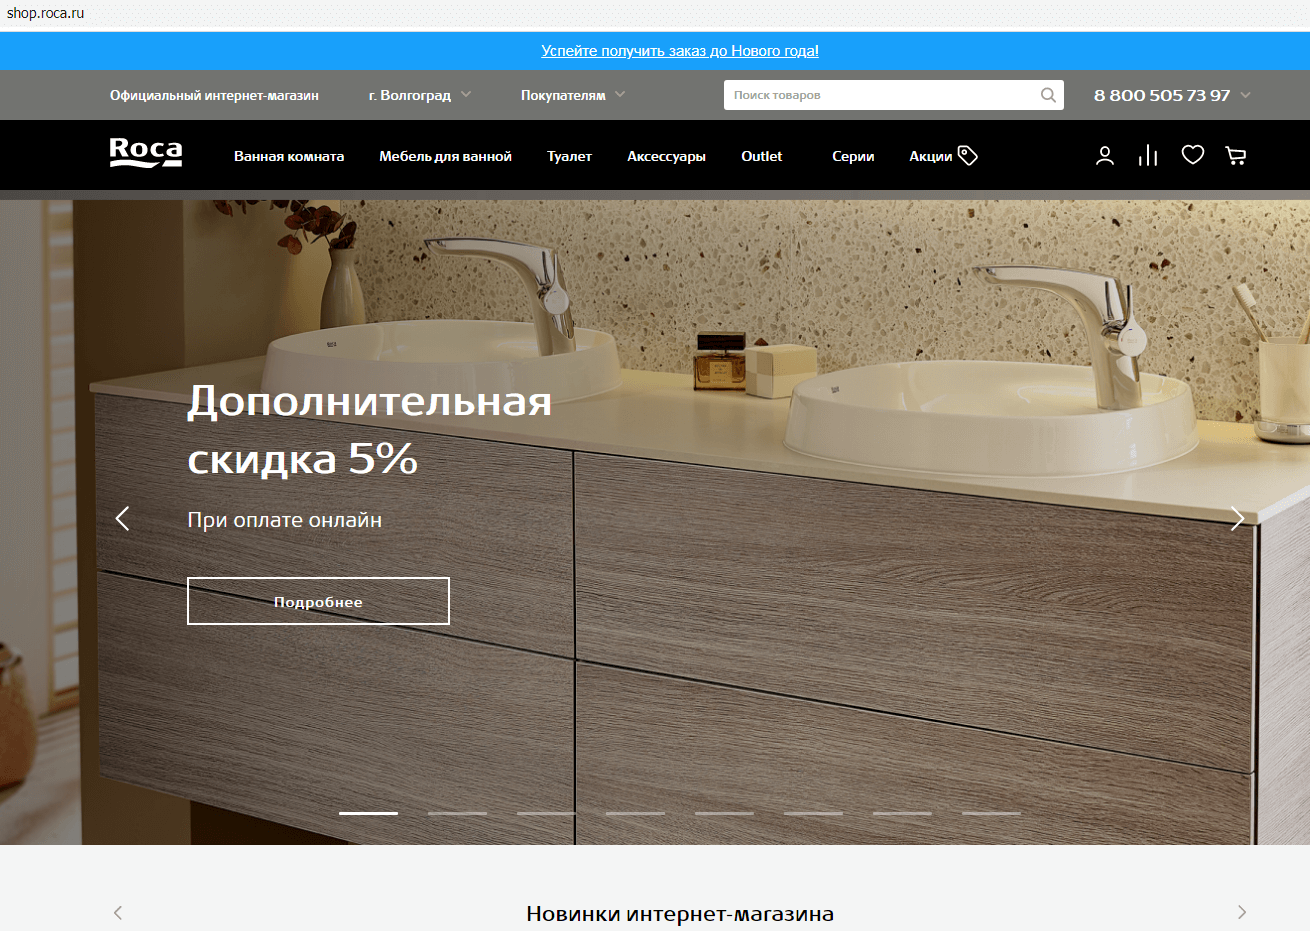 shop.roca.ru website